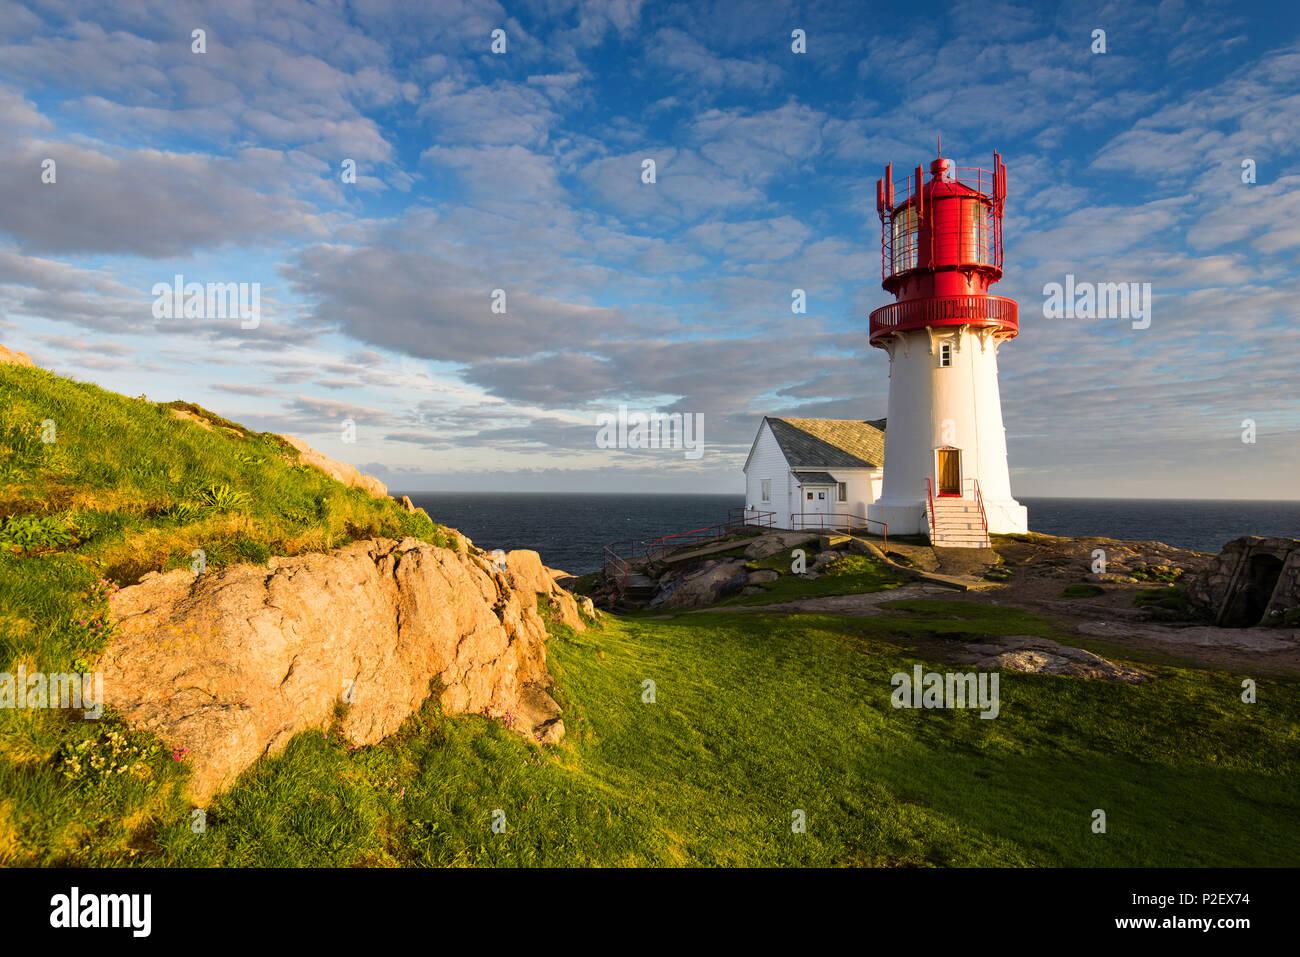 Sunset, Lighthouse, Lindesnes, Vest-Agder, Norway, Europe - Stock Image